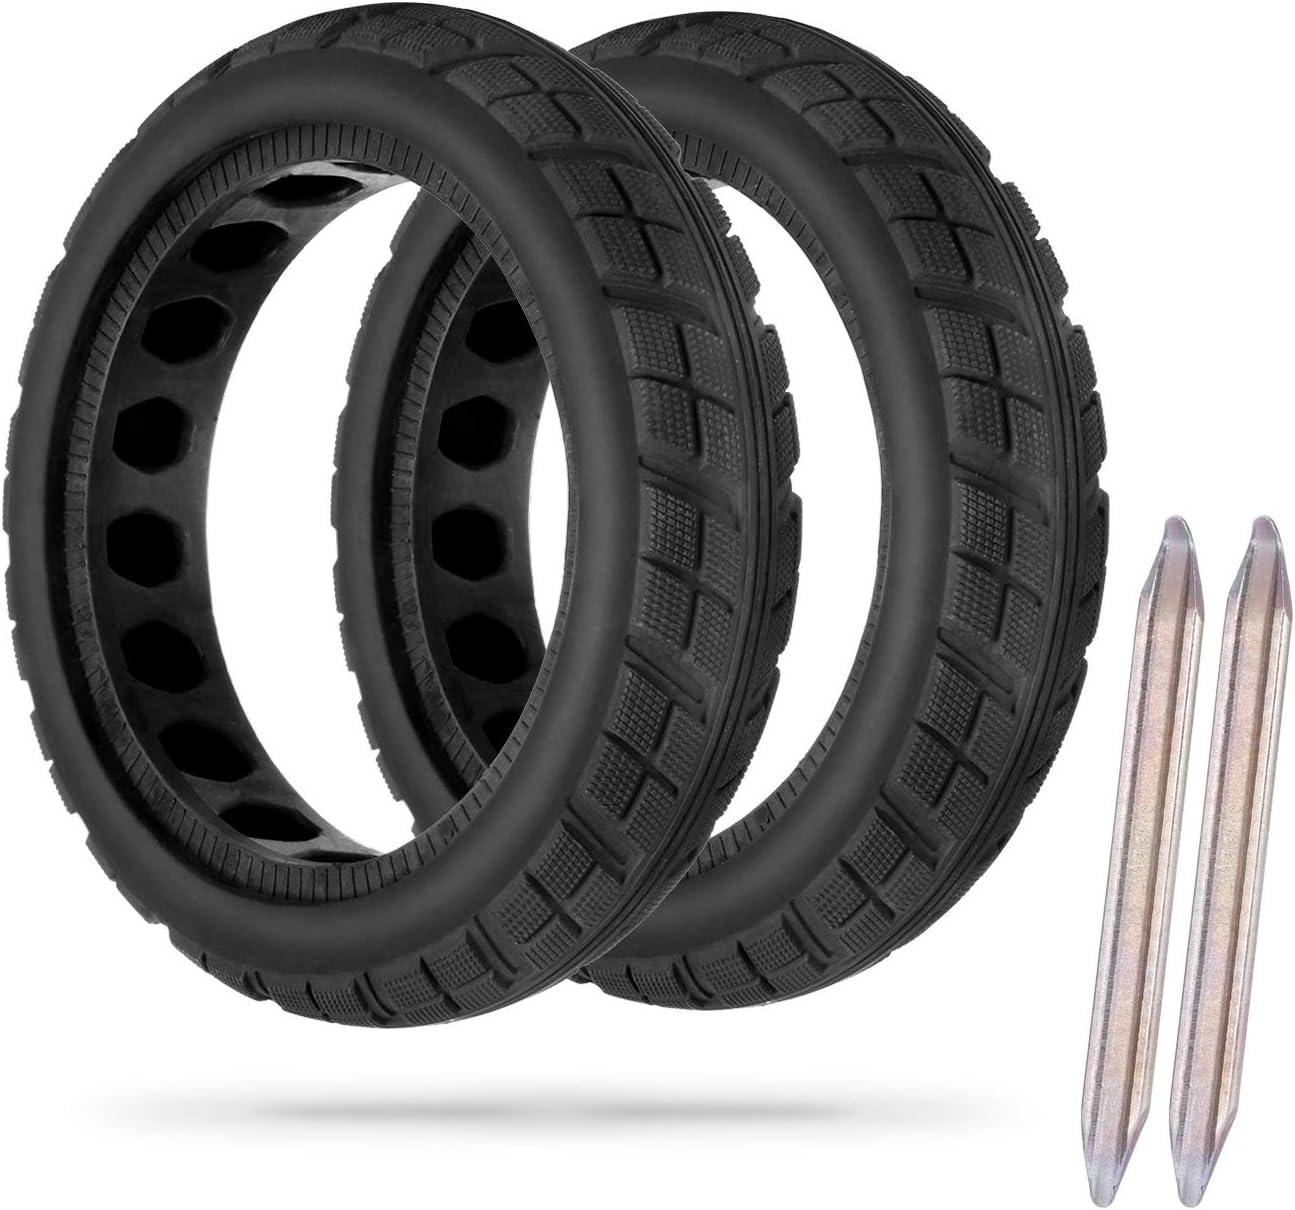 AGPTEK 2 Pcs Llanta Libre Reemplazo Neumático, Rueda Macizas para Scooter Eléctrico Xiaomi M365 con 2 Palo de Neumático, Neumáticos sin Inflación, Negro